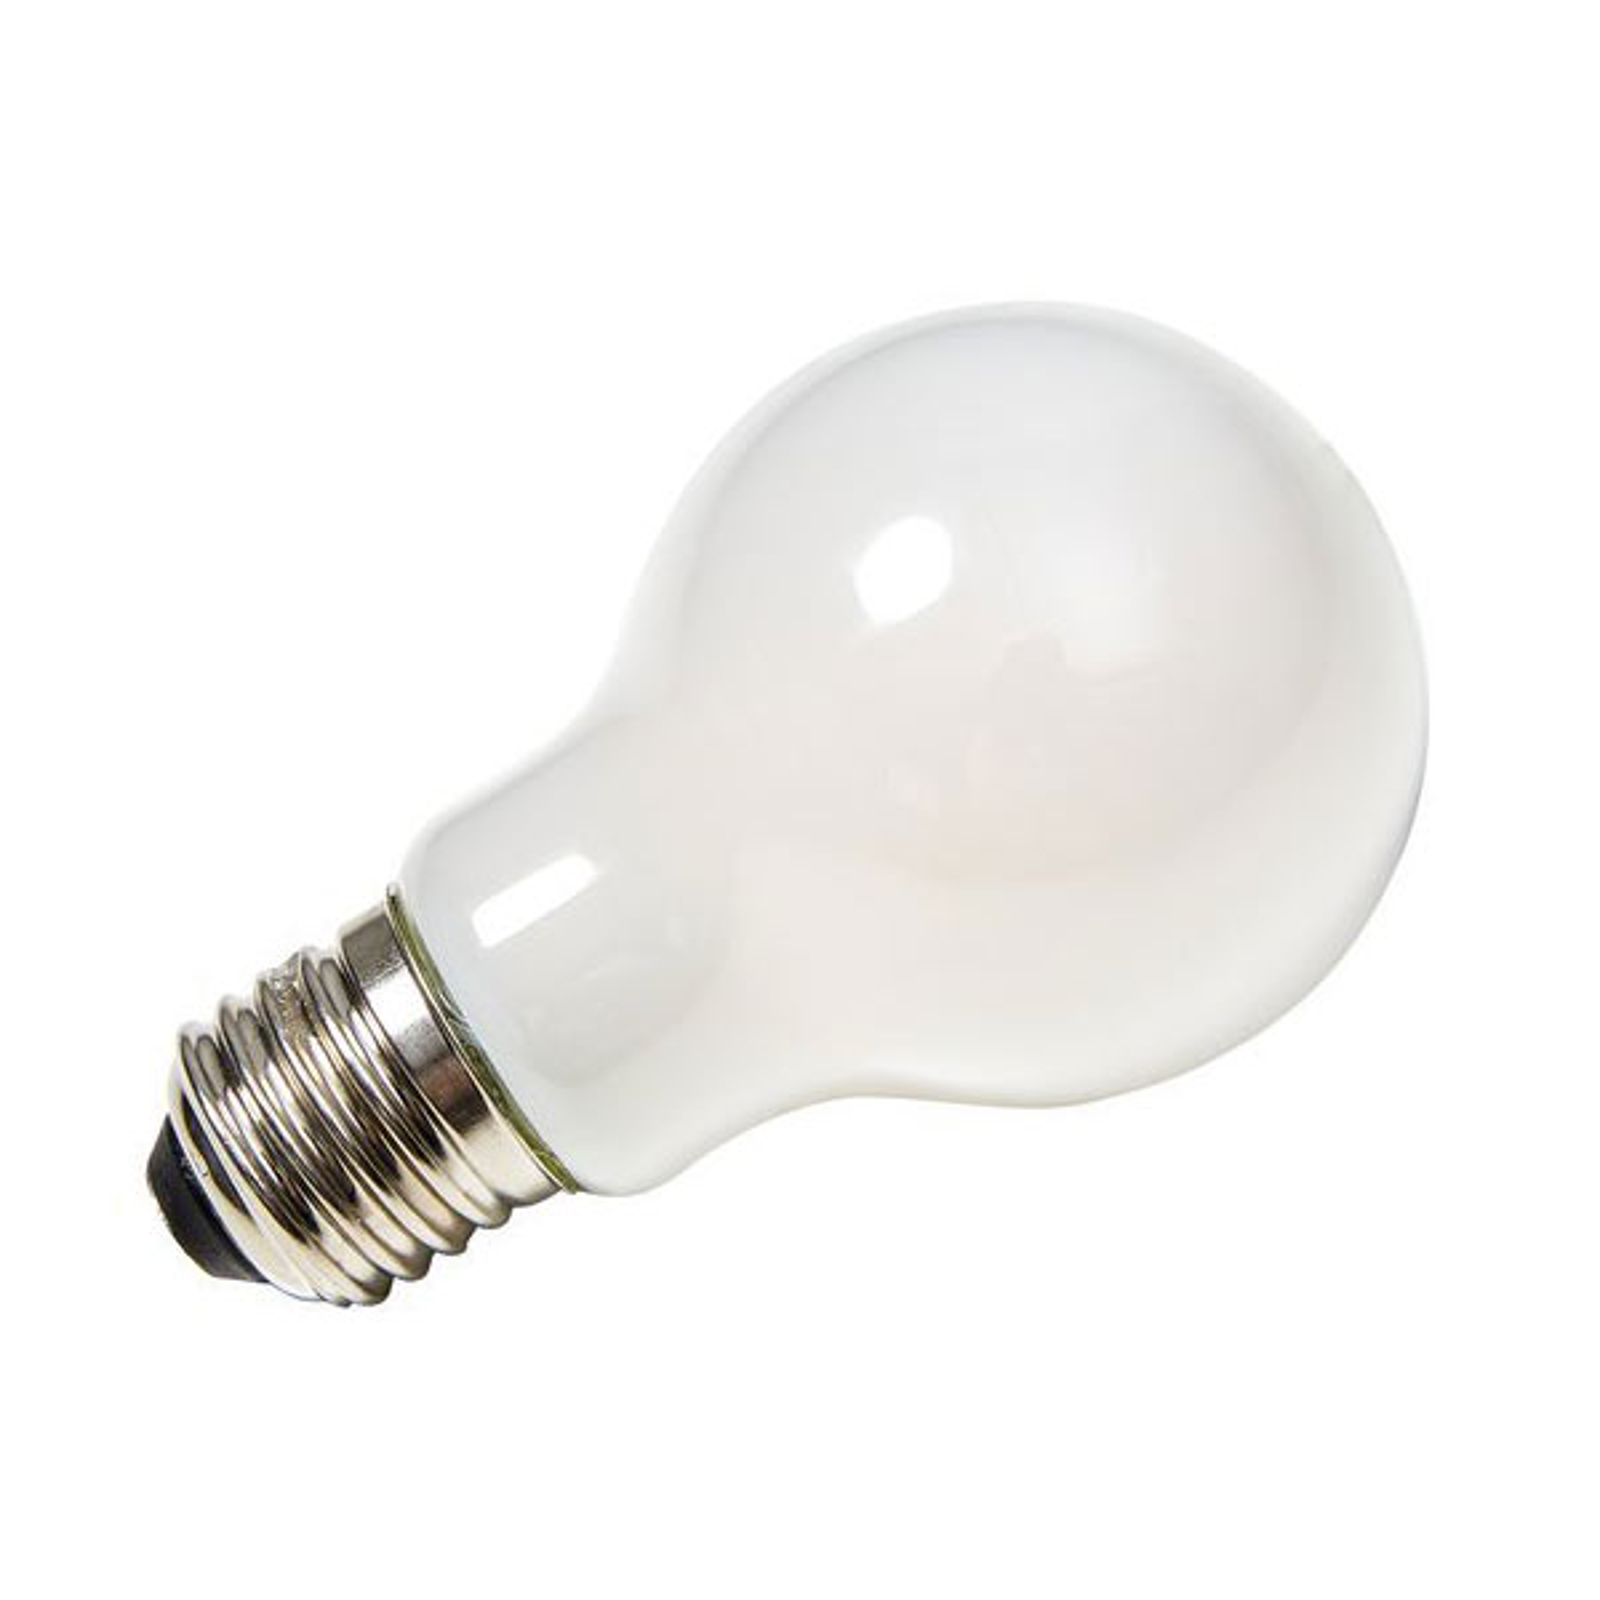 SLV LED-Lampe E27 7W A60 dimmbar warmweiß